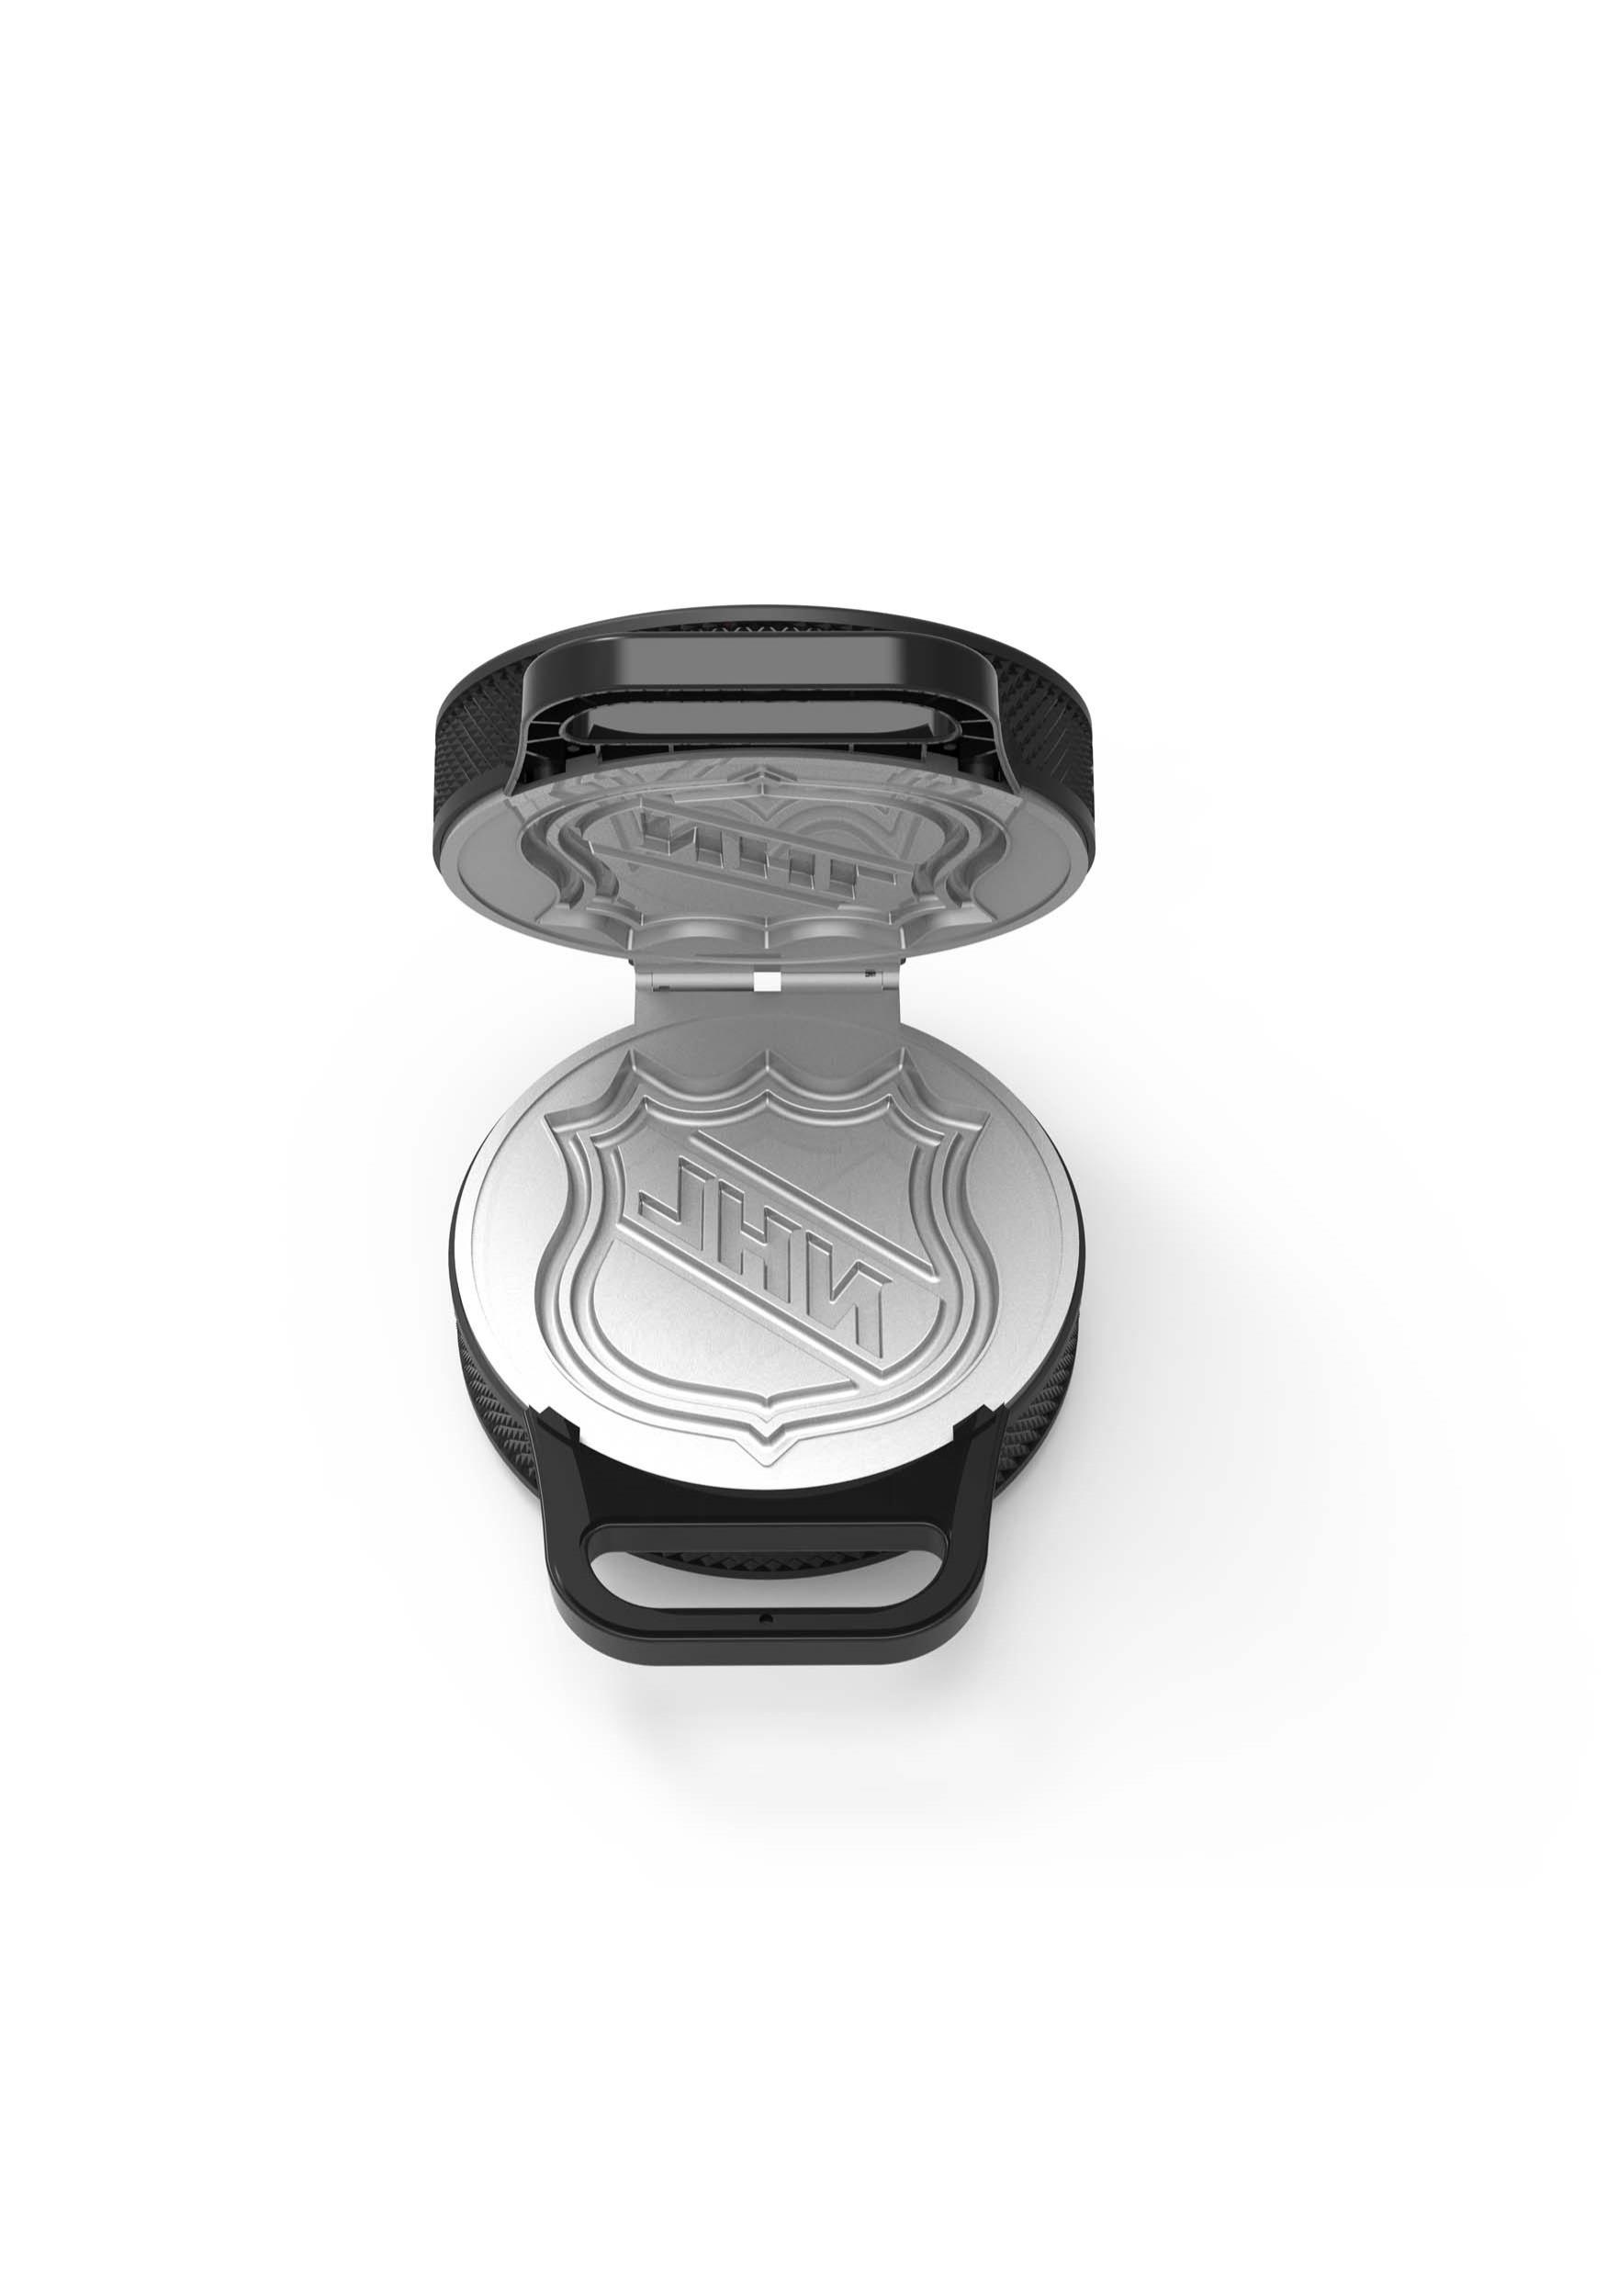 NHL Hockey Puck Waffle Maker PBWMVP-NHL-SHLD